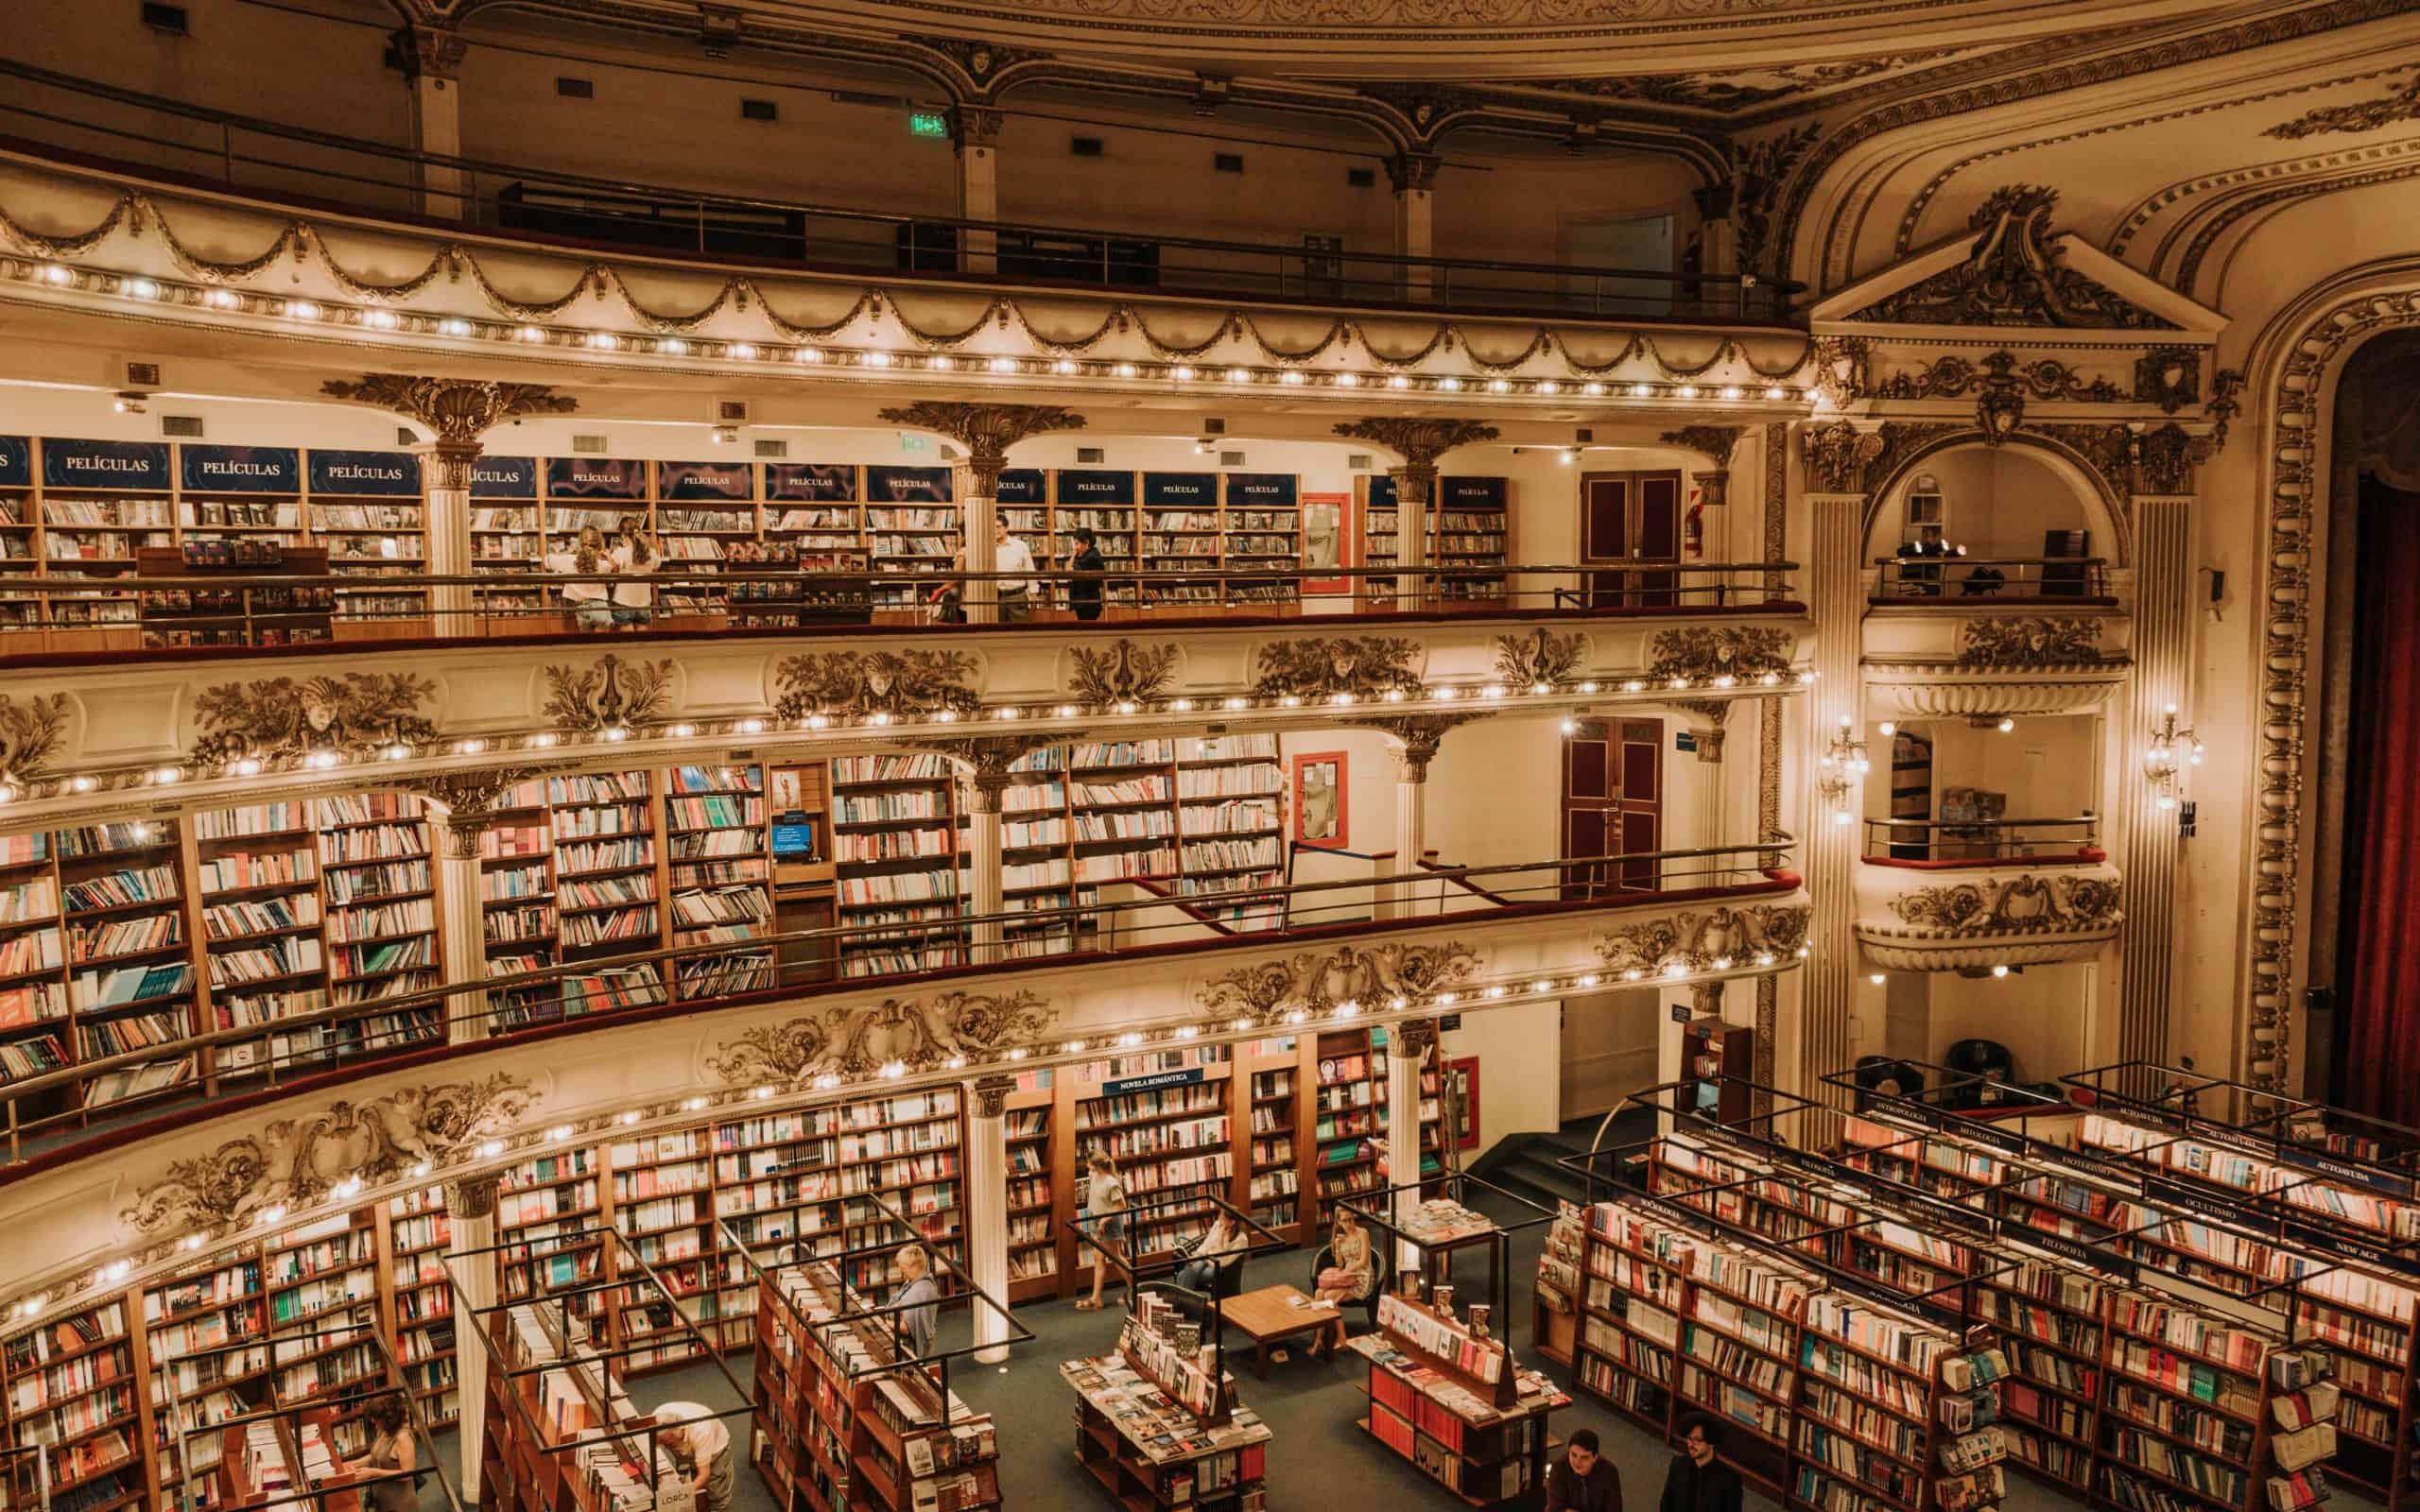 Ateneo splendid Buenos Aires księgarnia co zobaczyć